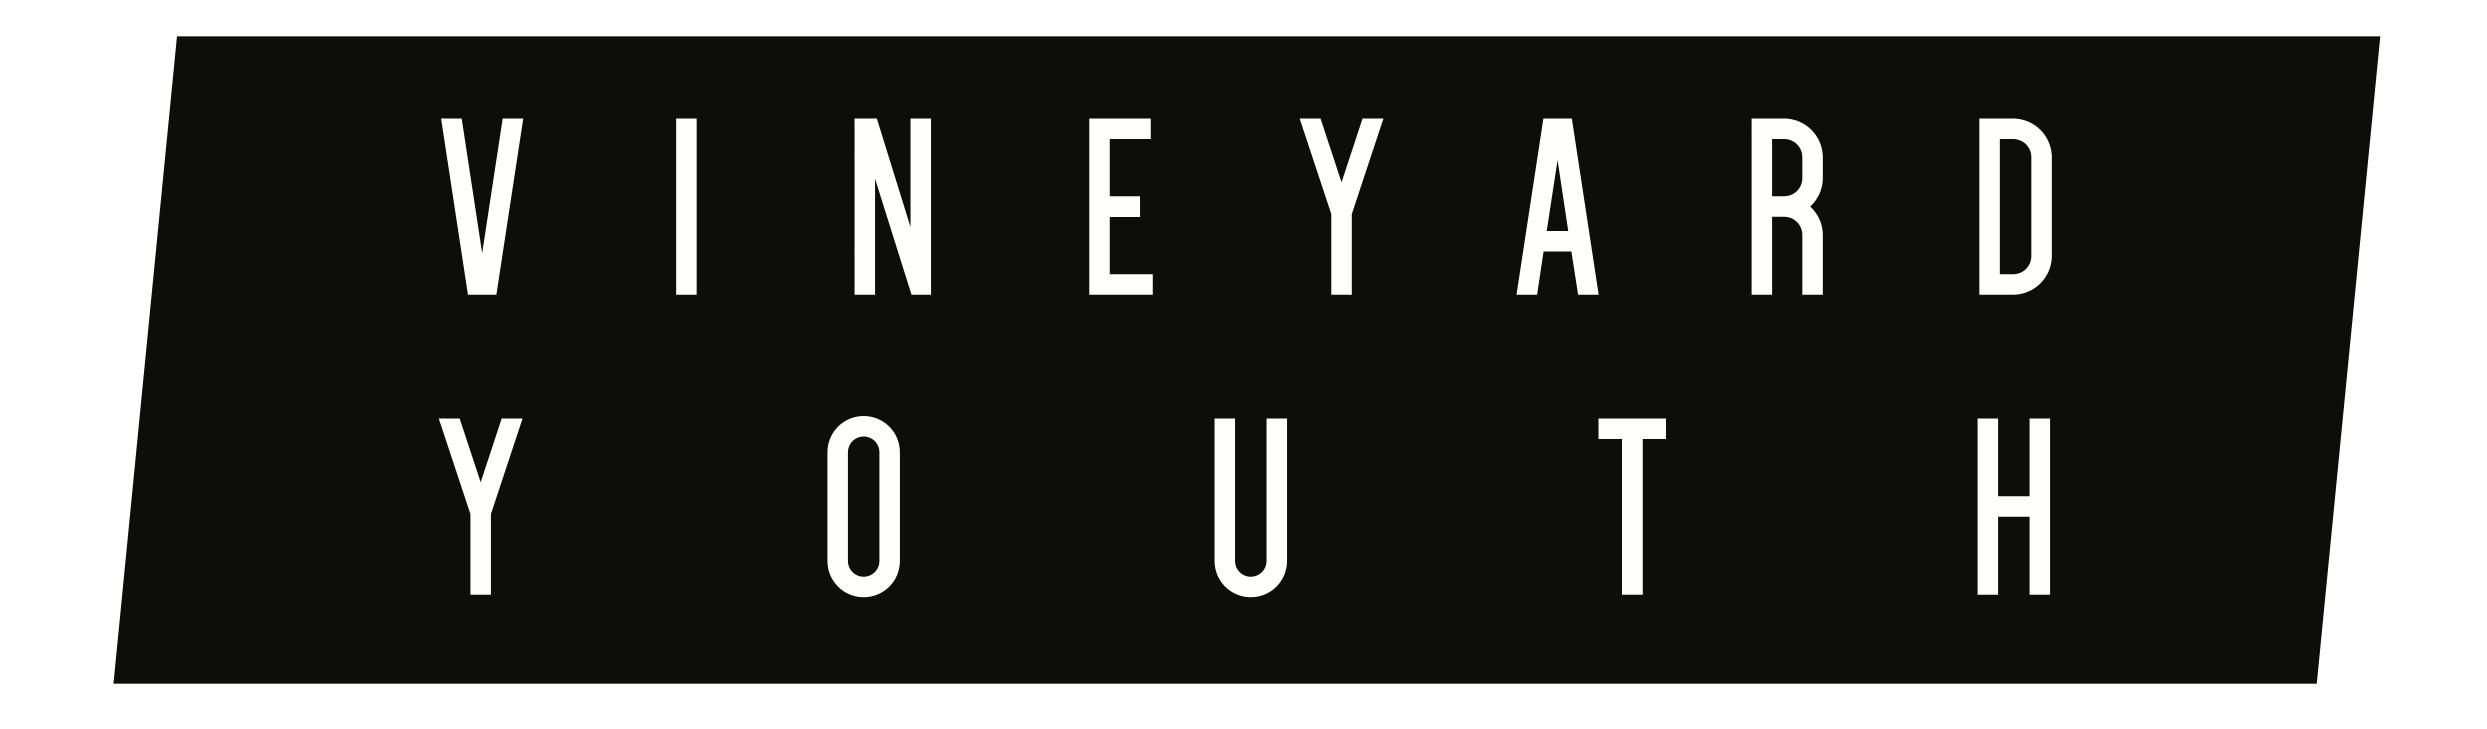 VineyardYouth-Logo-Option.jpg